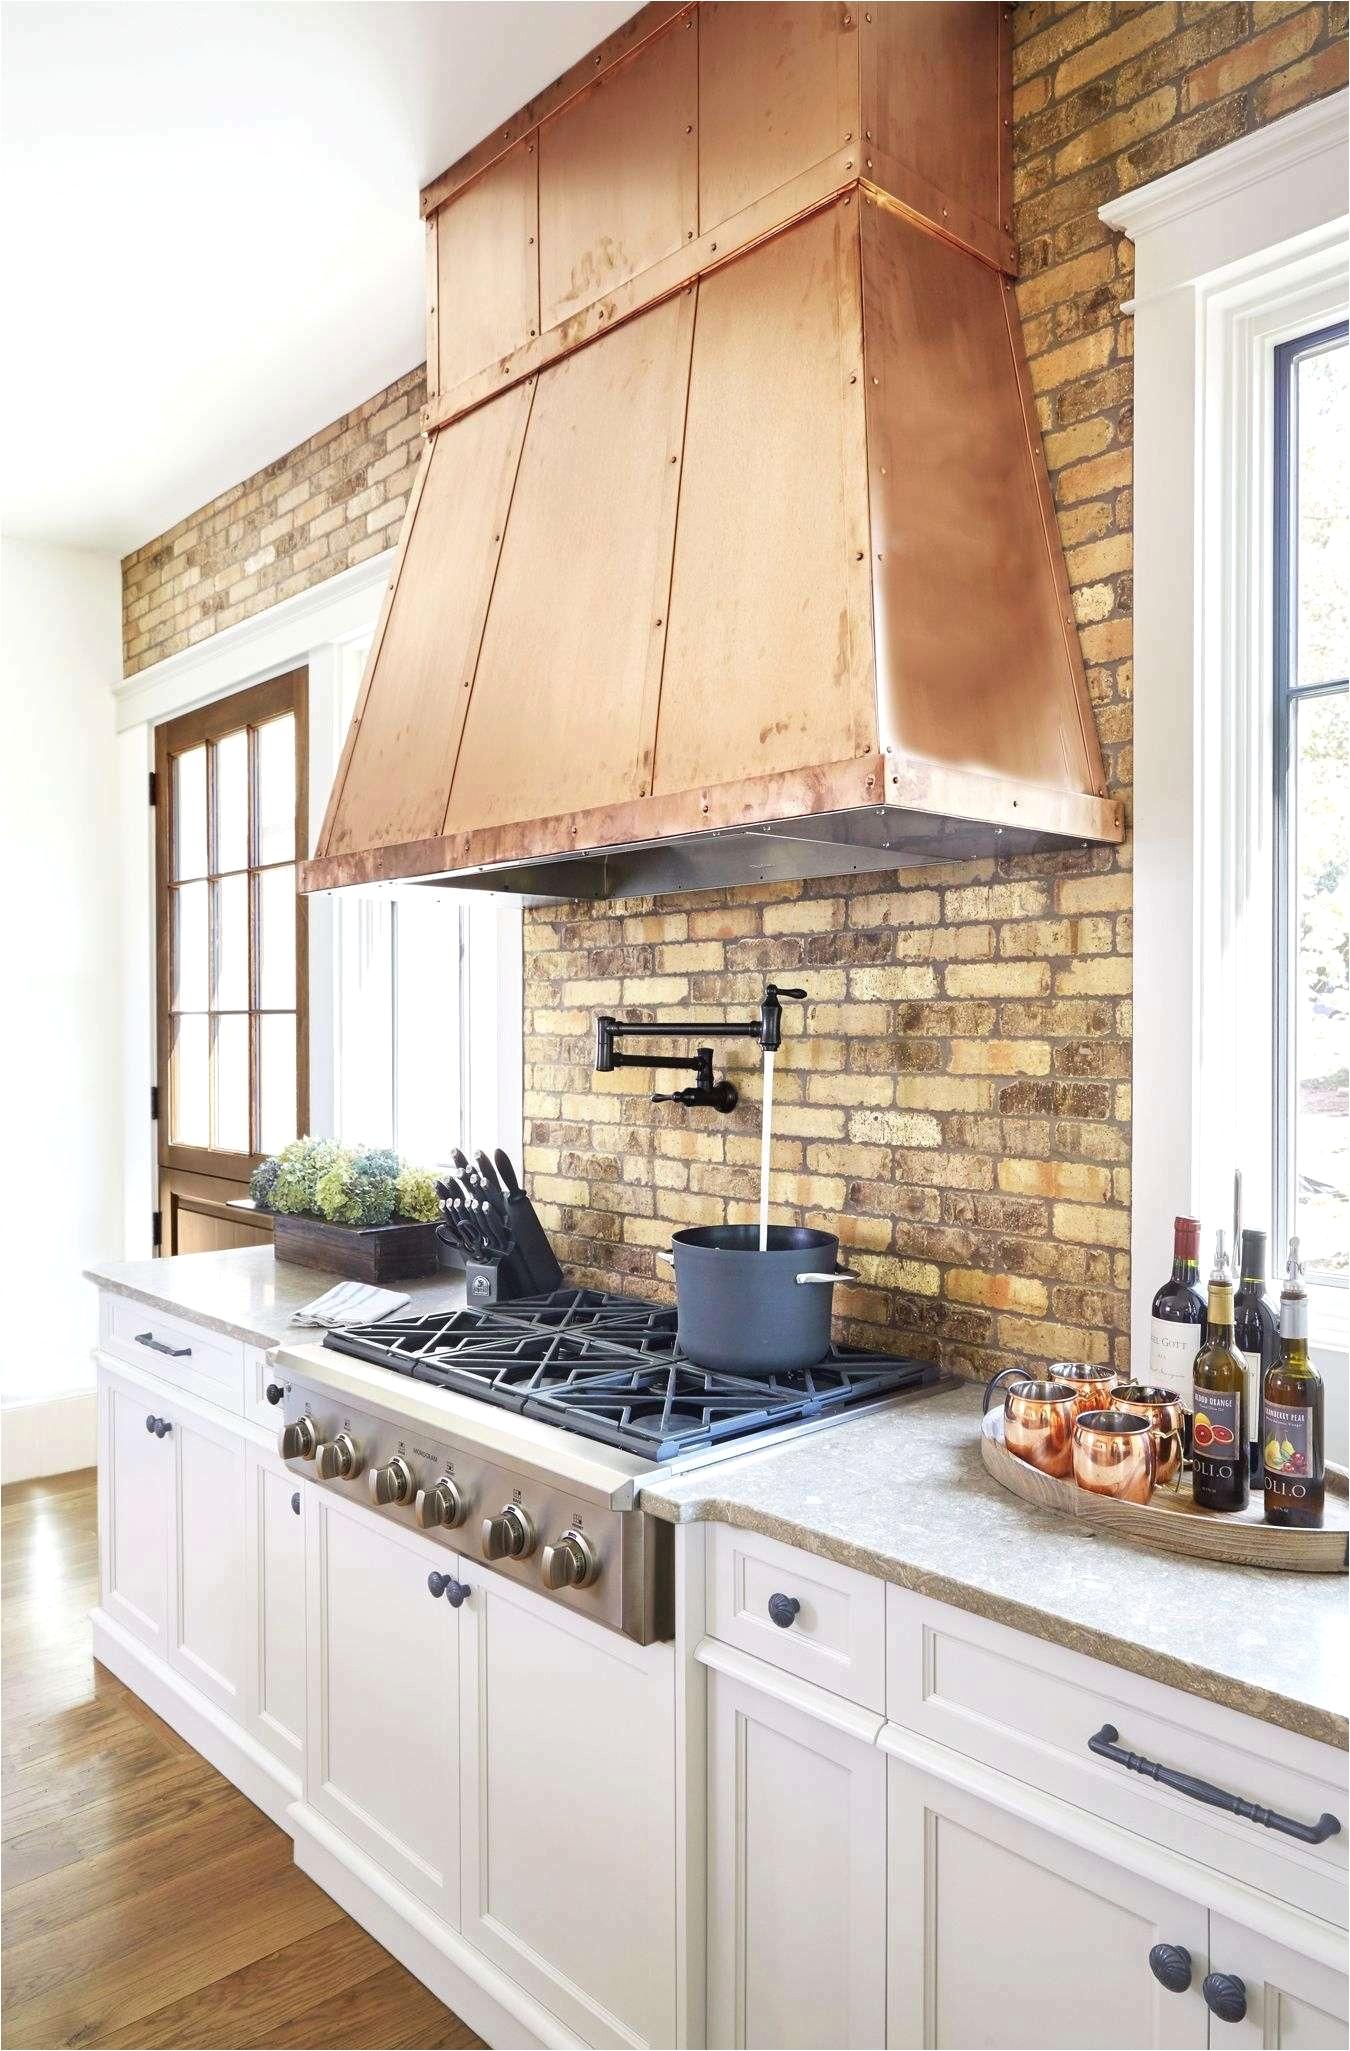 Interior Design Kitchens New Kitchen Design Pinterest New Kitchen L Kitchen L Kitchen 0d